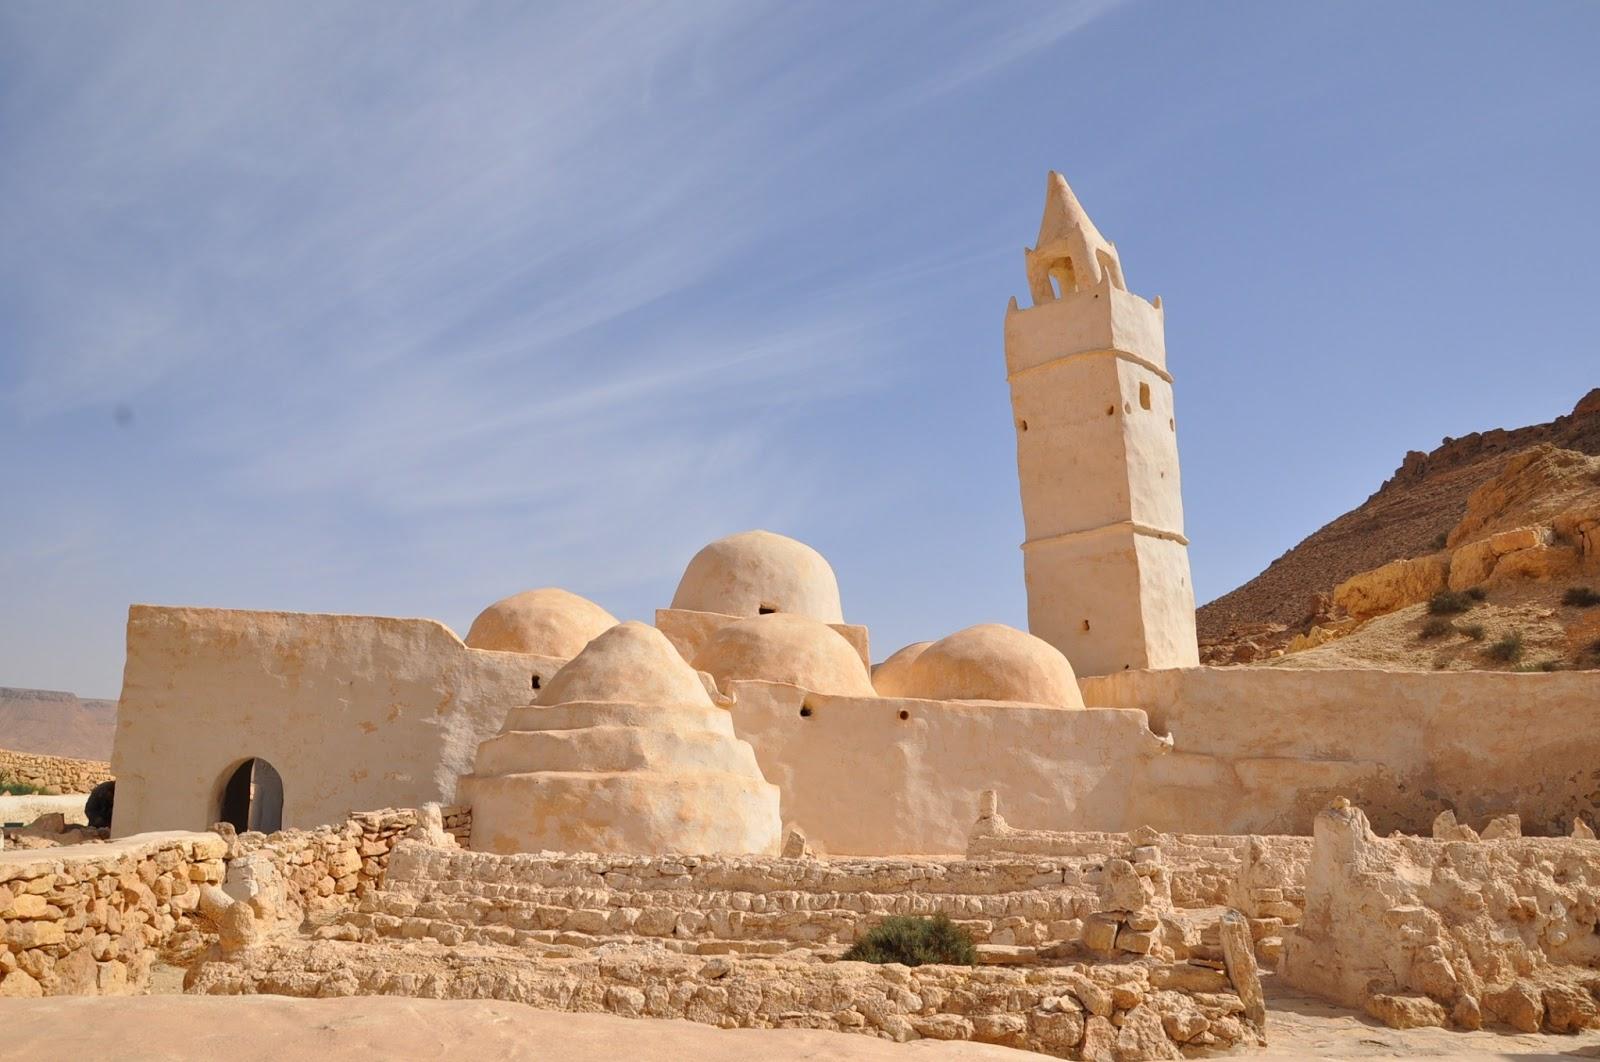 Tataounine, Tunisia (Photo courtesy of Blogspot)